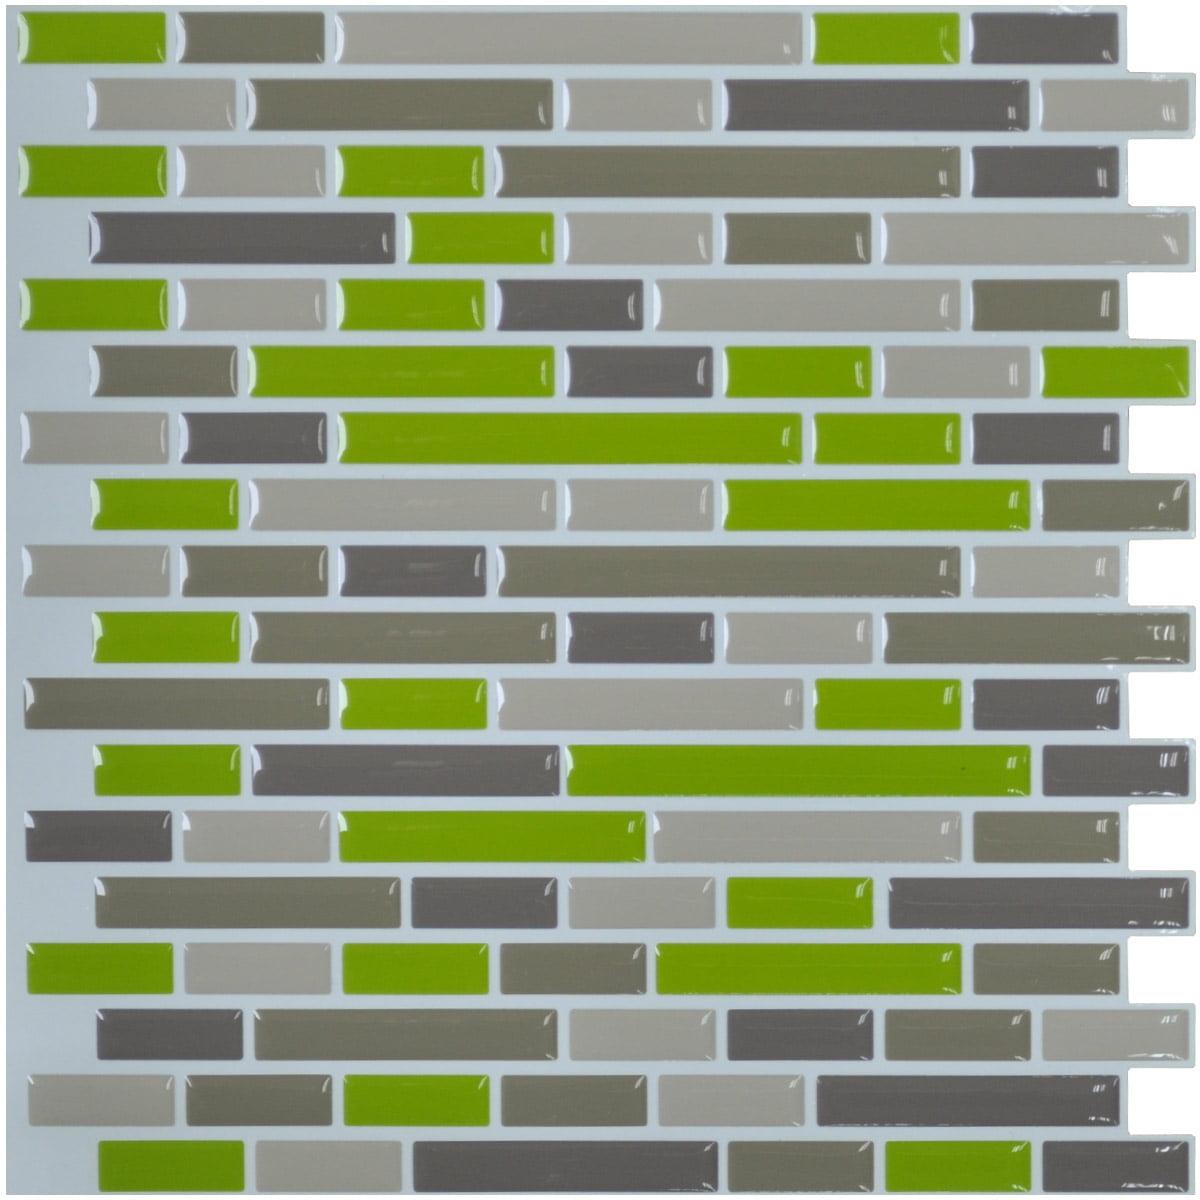 art3d kitchen backsplash peel and stick tile smart green brick art3d kitchen backsplash peel and stick tile smart green brick design walmart com